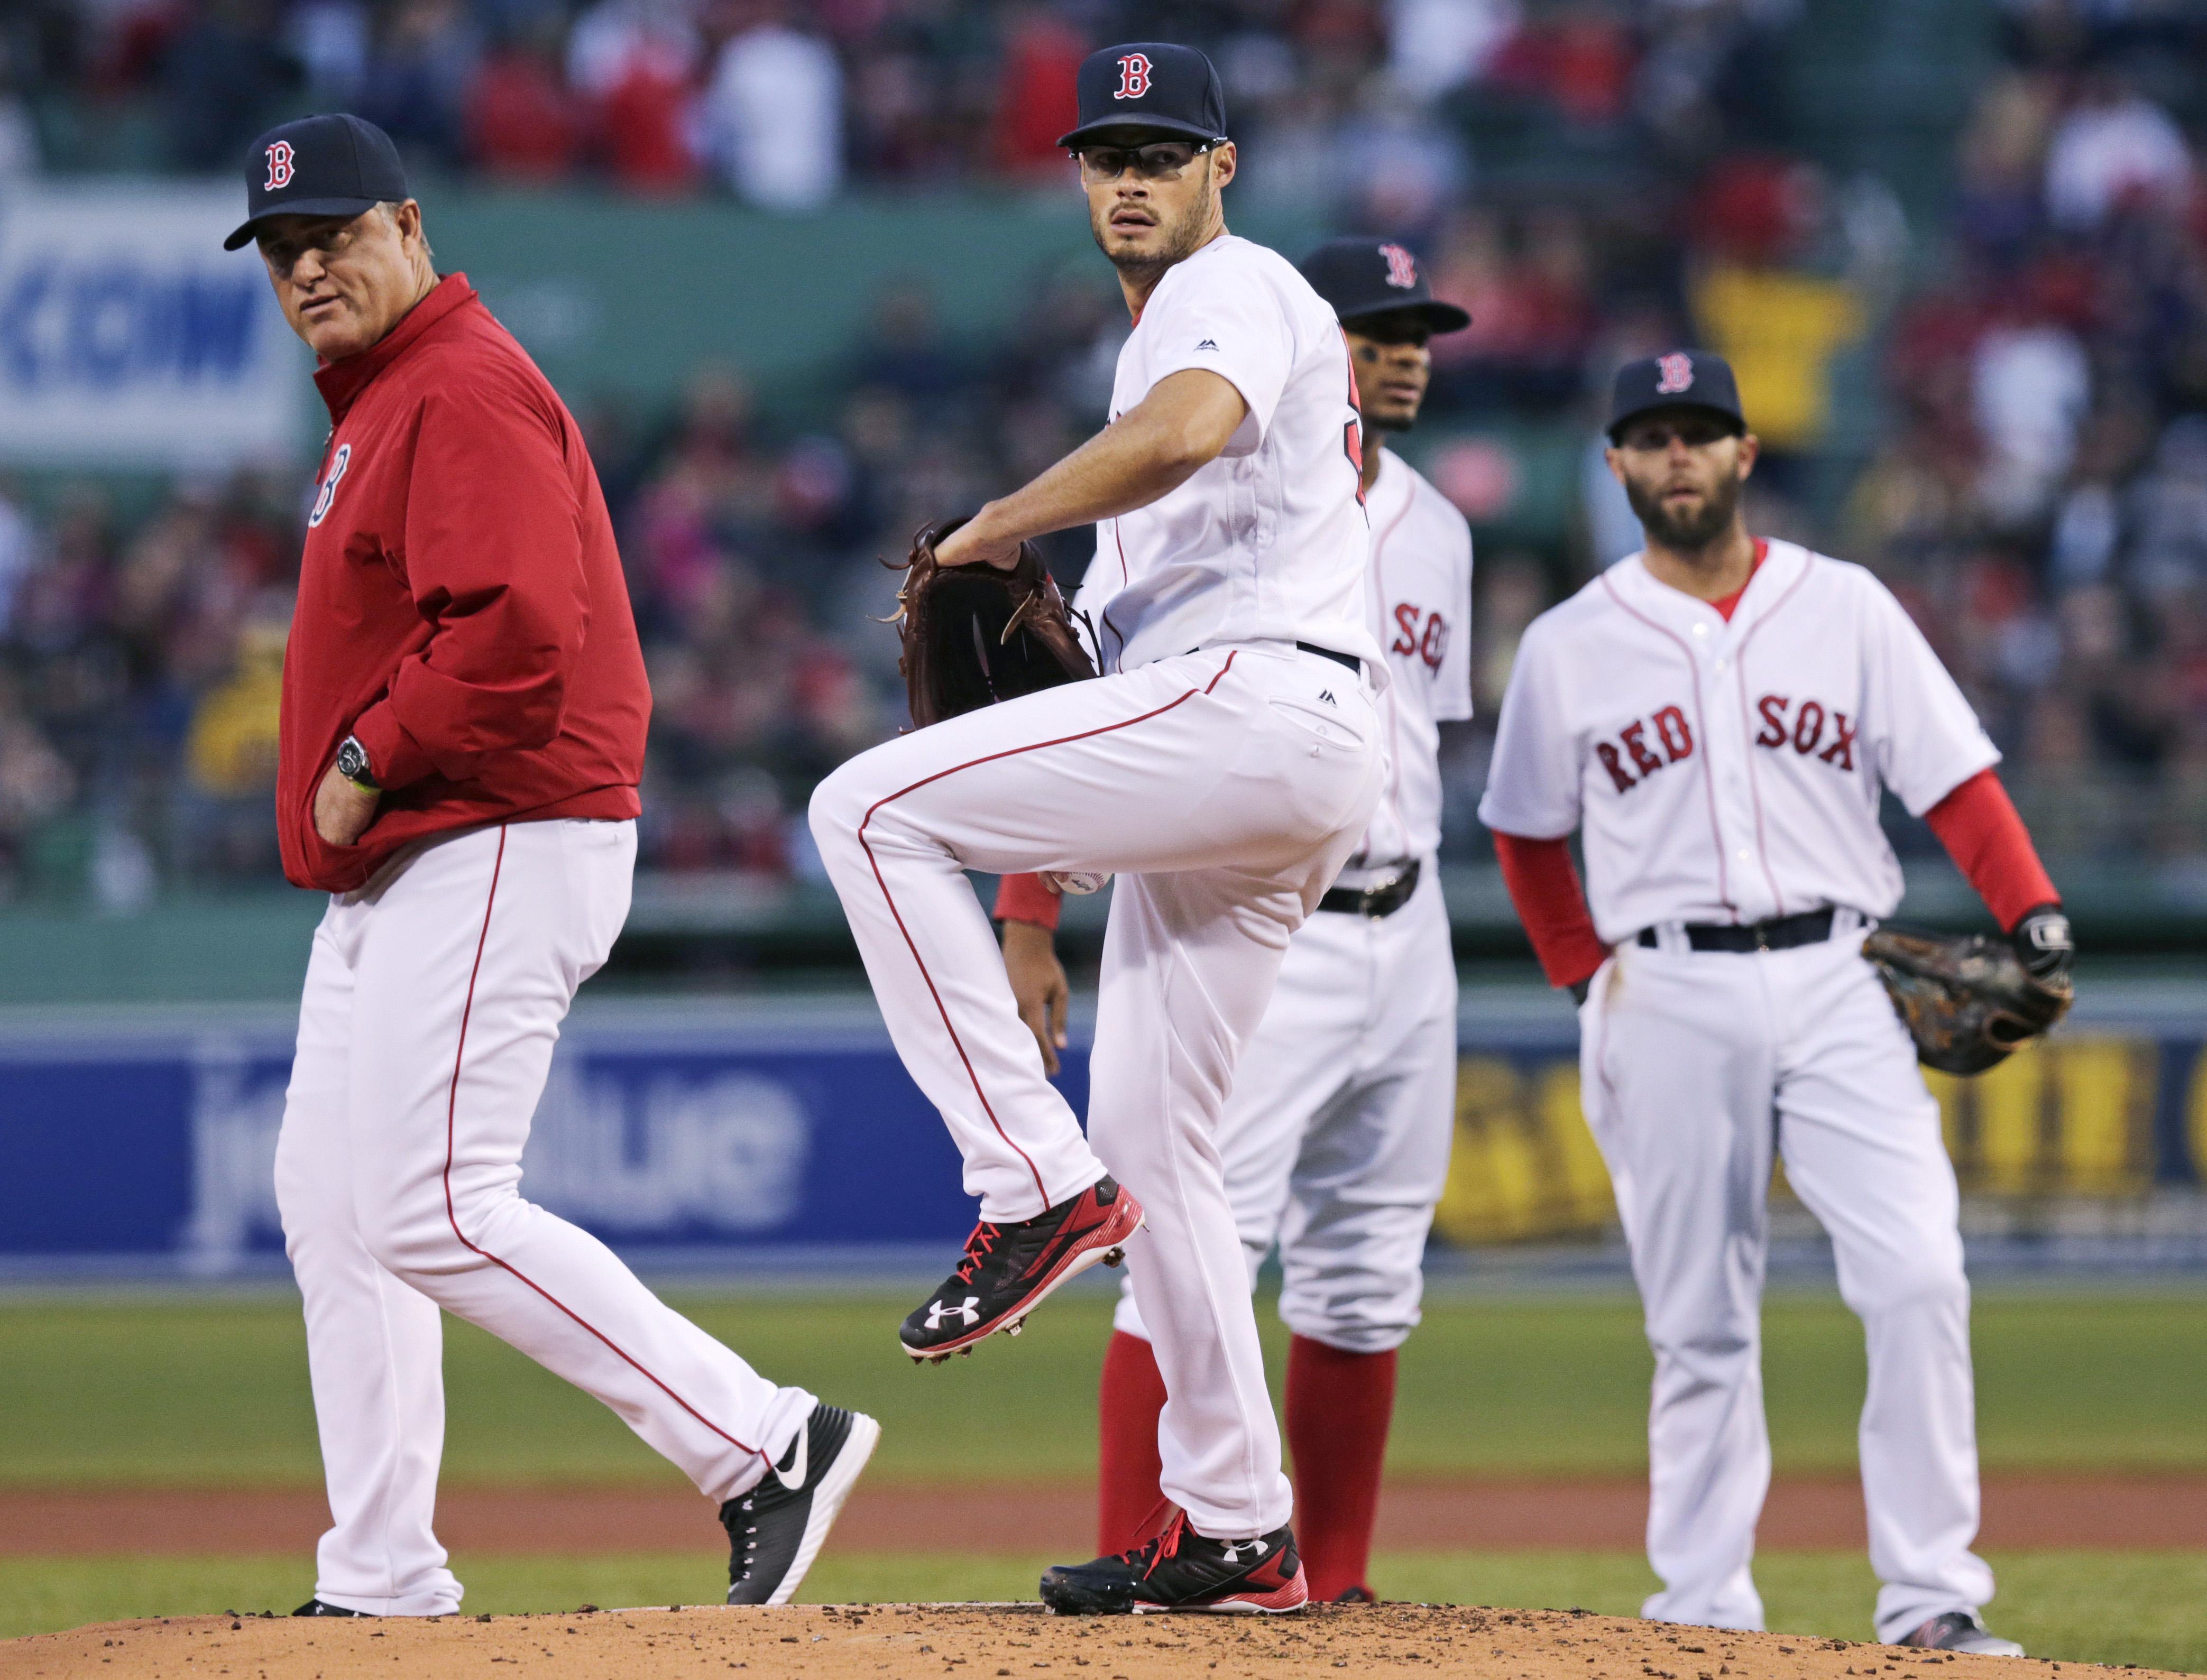 Rays_red_sox_baseball